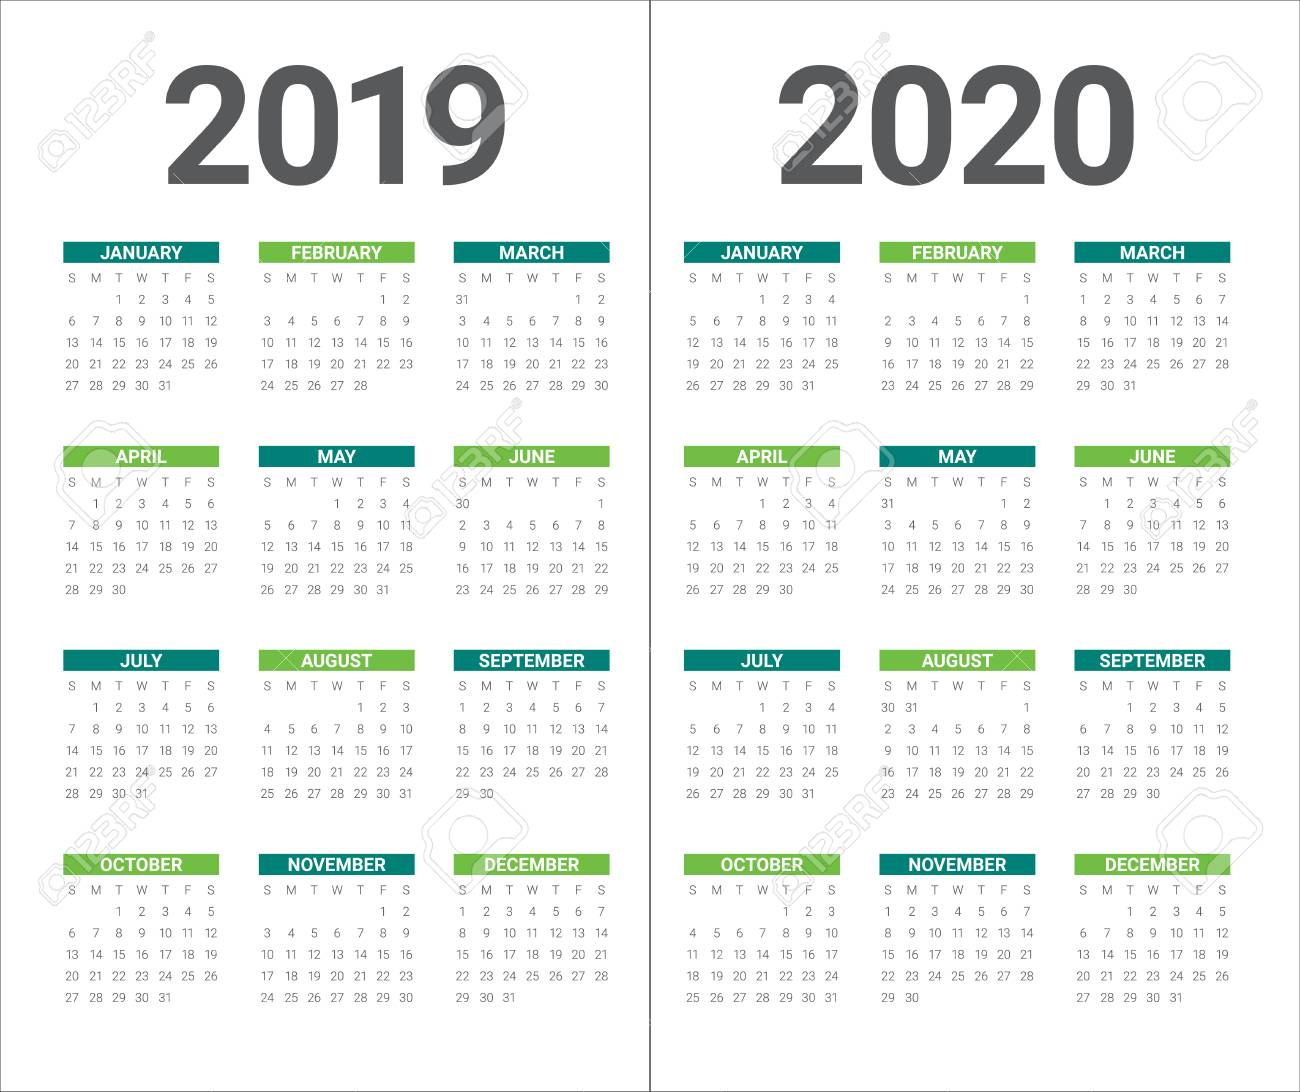 2020 Calendar Photo | Calendar Printable Free